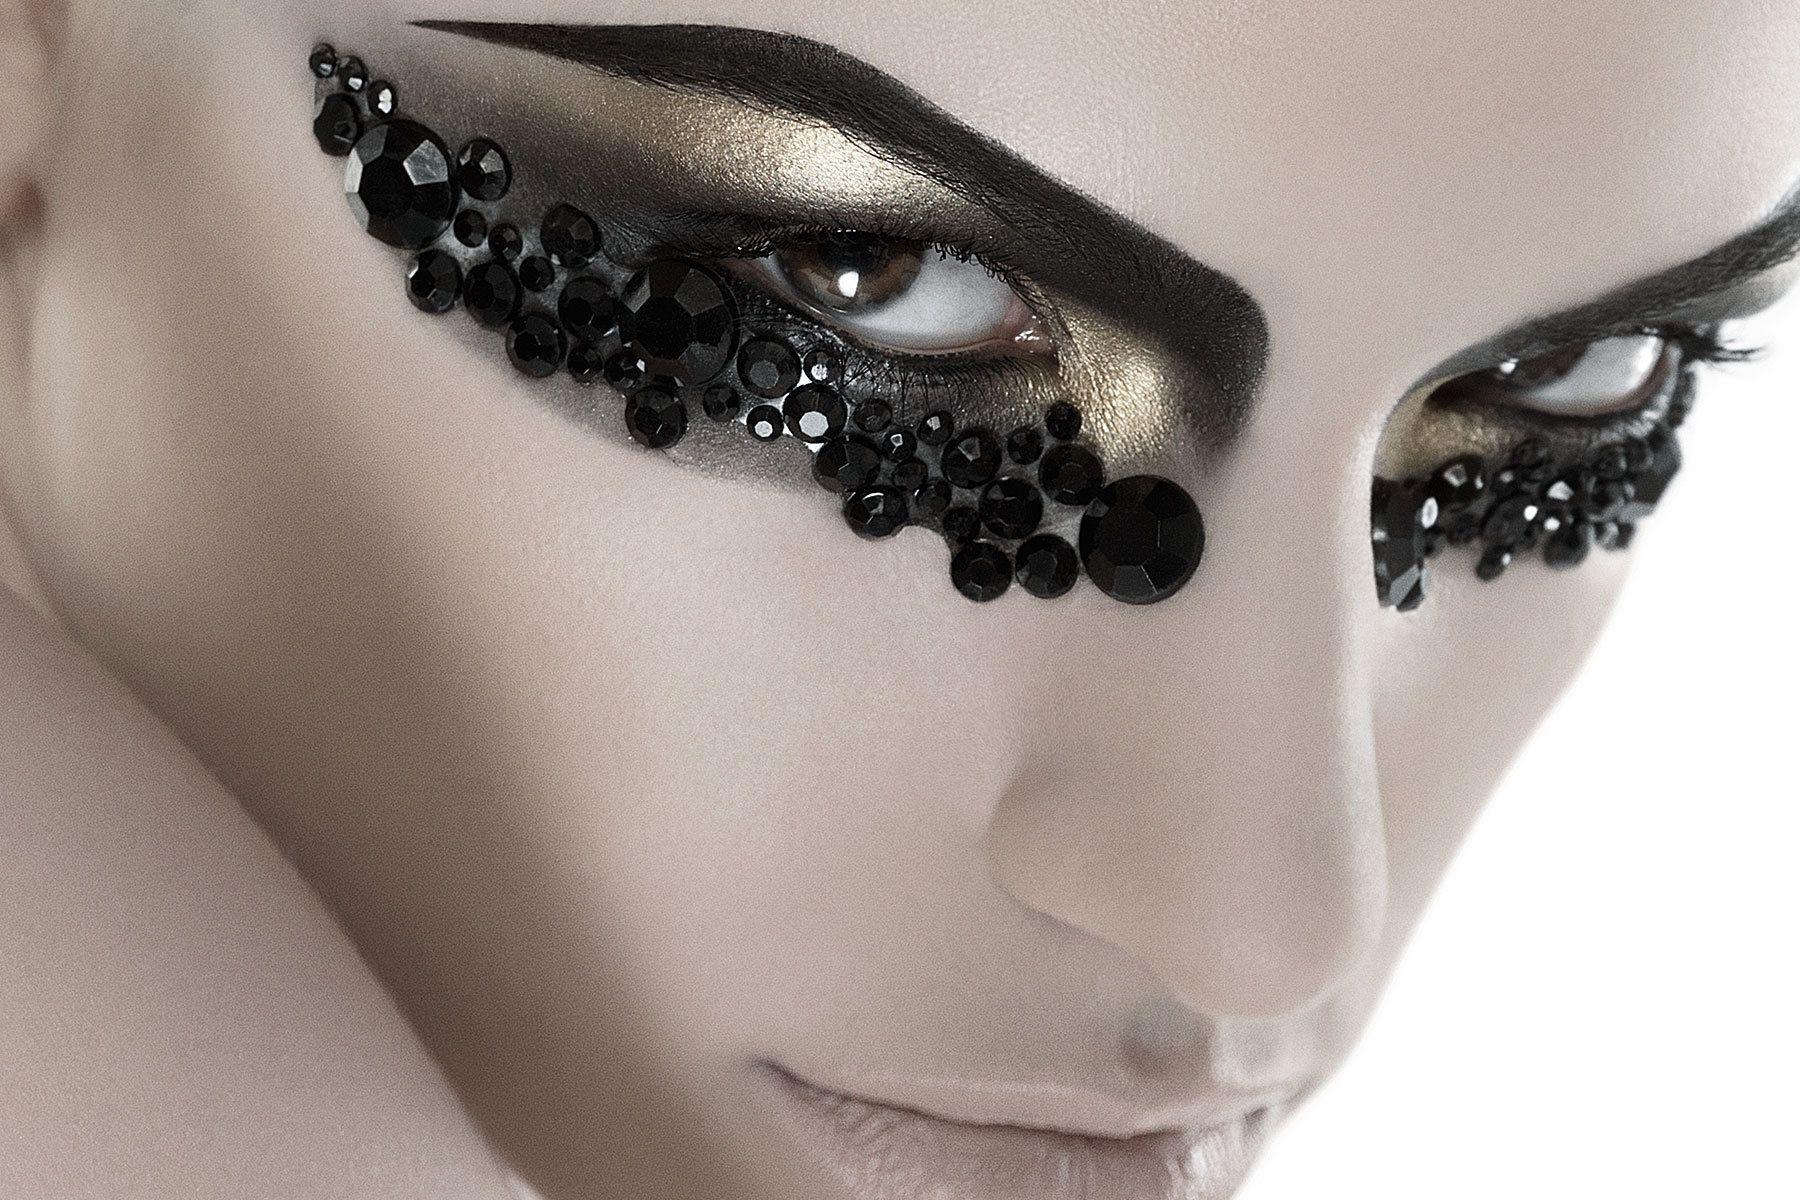 1beauty_fashion_close_up.jpg